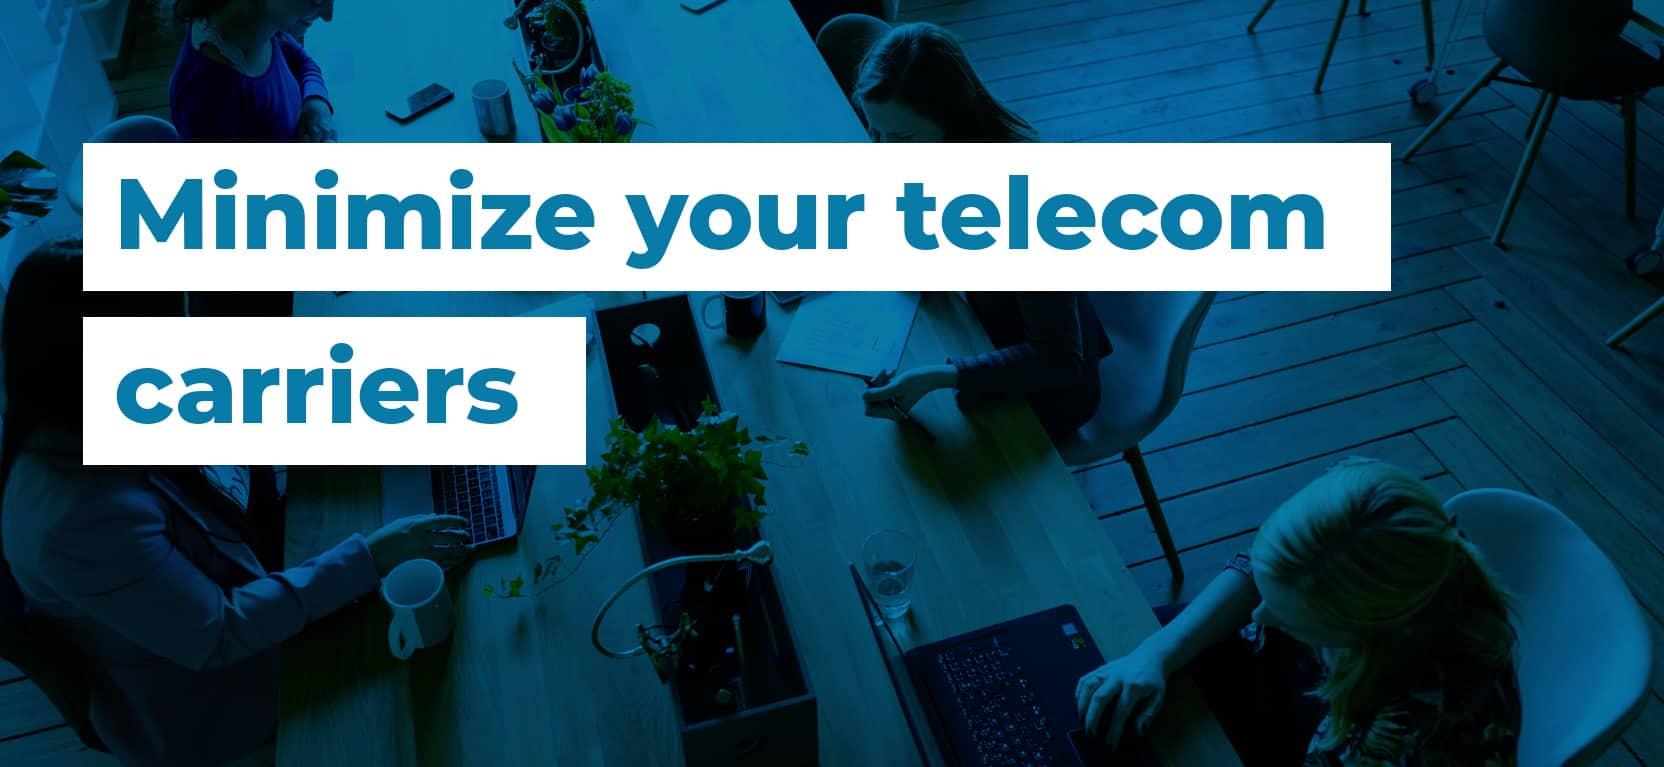 59 Minimize your telecom carriers2